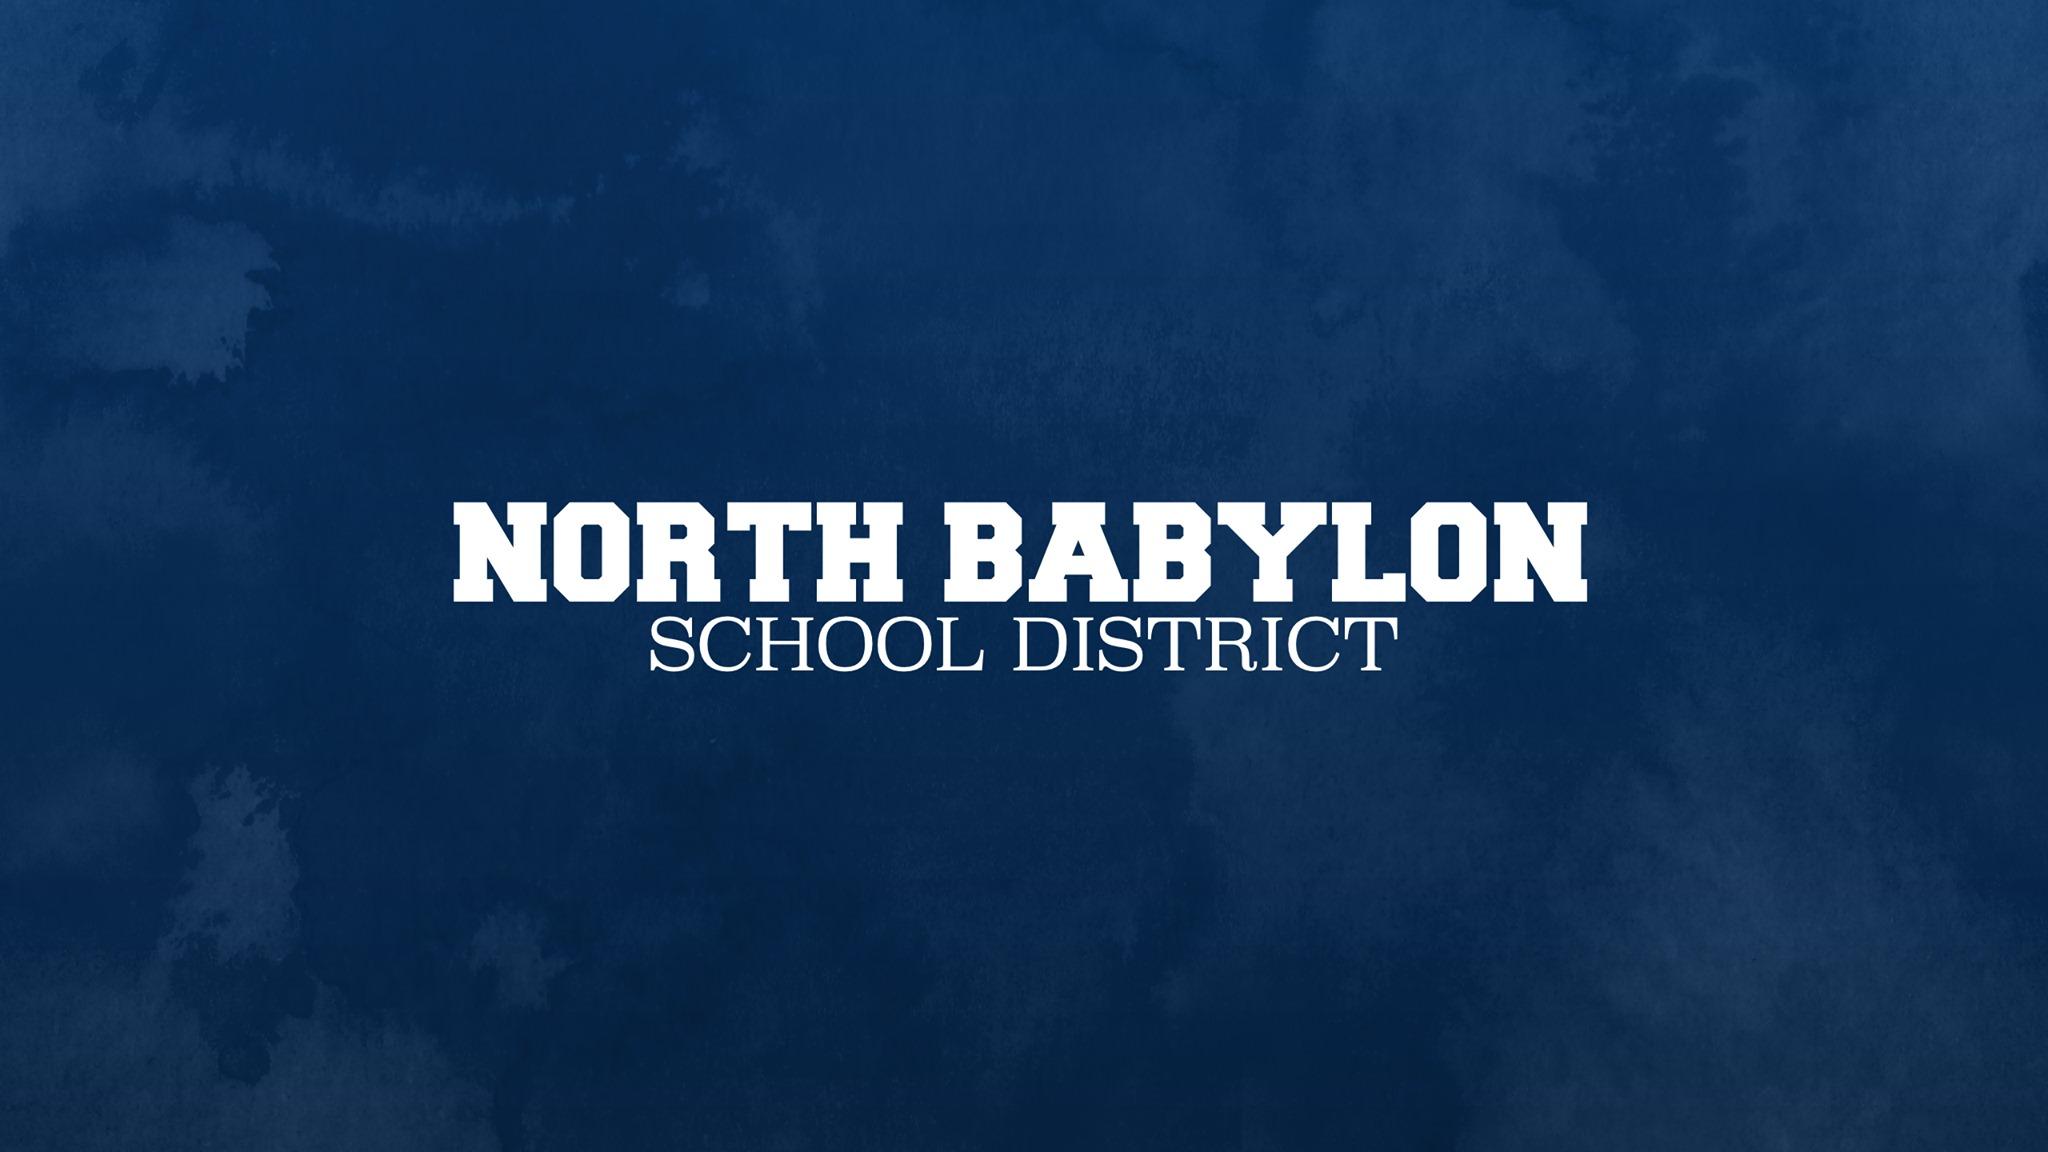 North Babylon School District